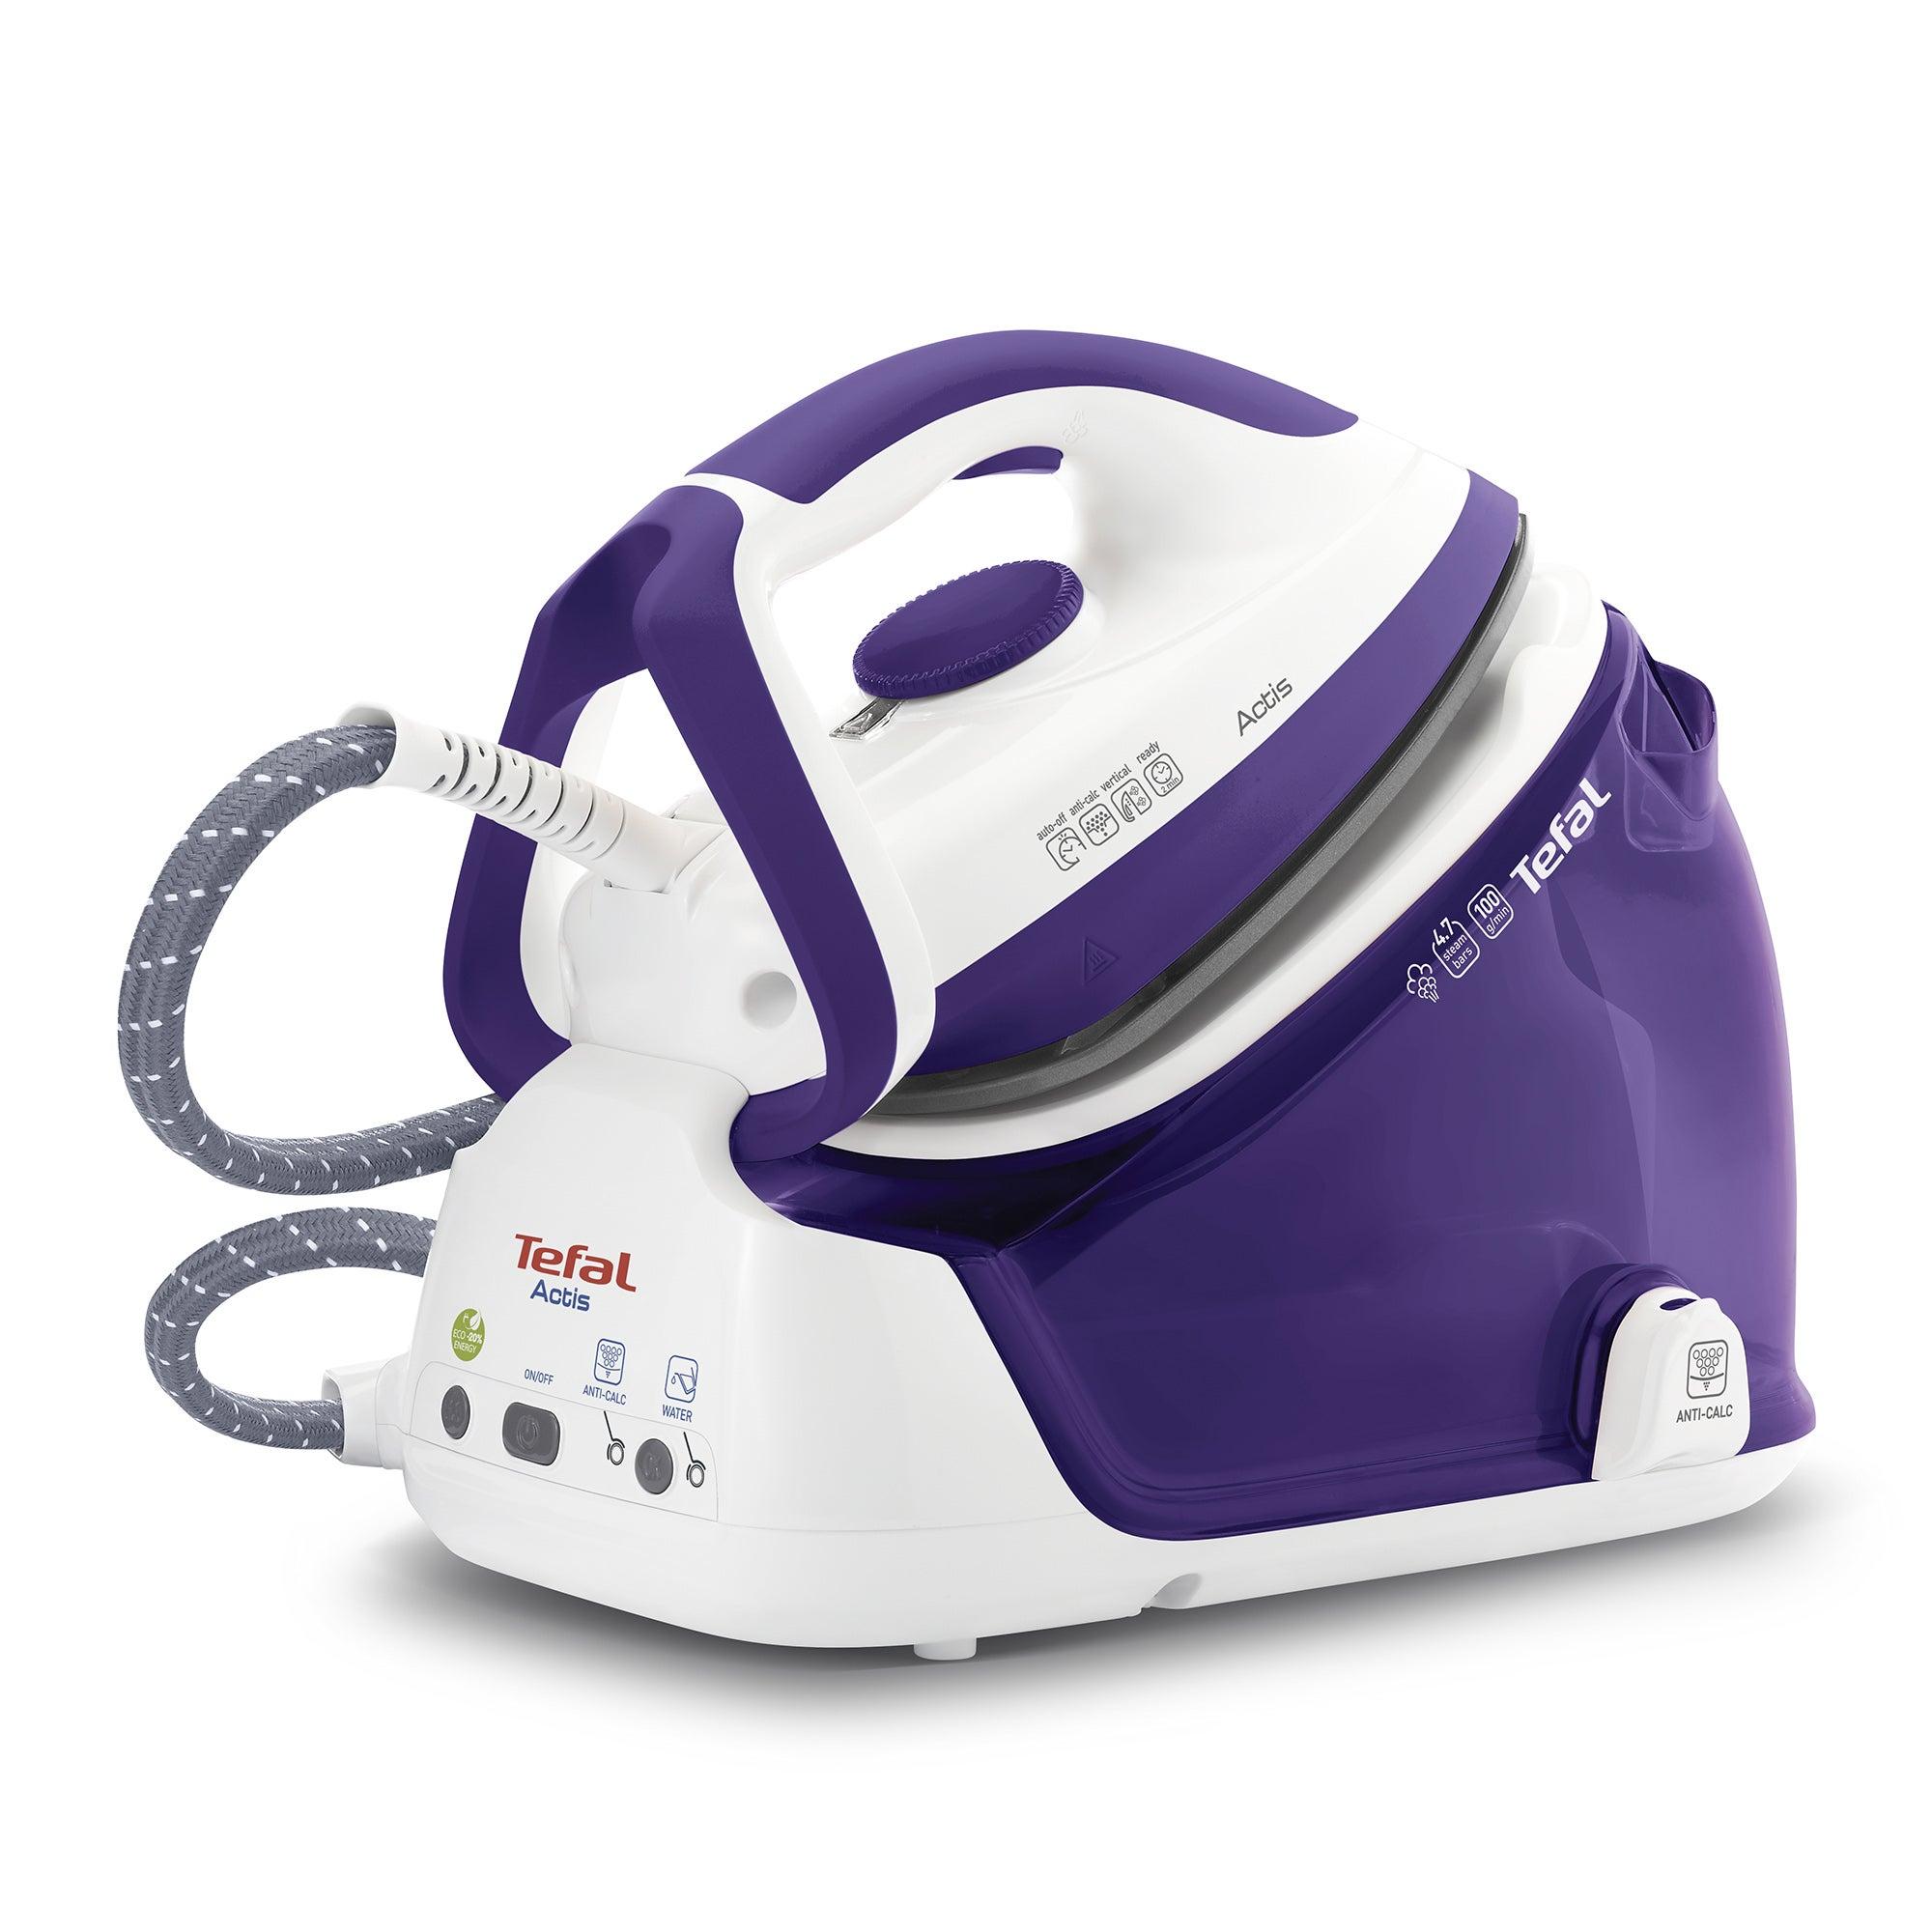 Tefal Actis Steam Generator GV6340 Purple